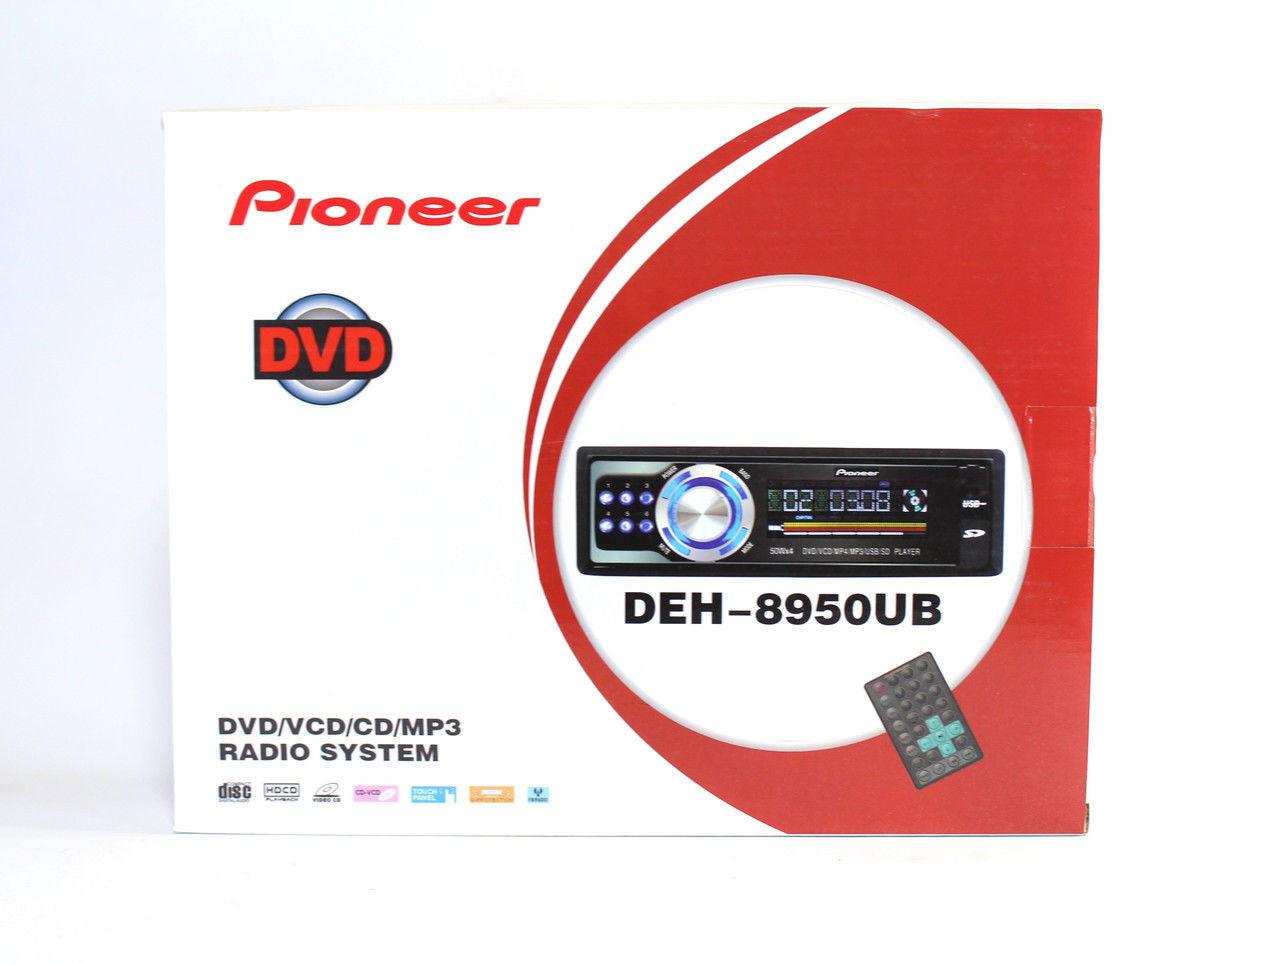 Автомагнитола DVD Pioneer DEH-8950 UB, магнитола Pioneer 8950